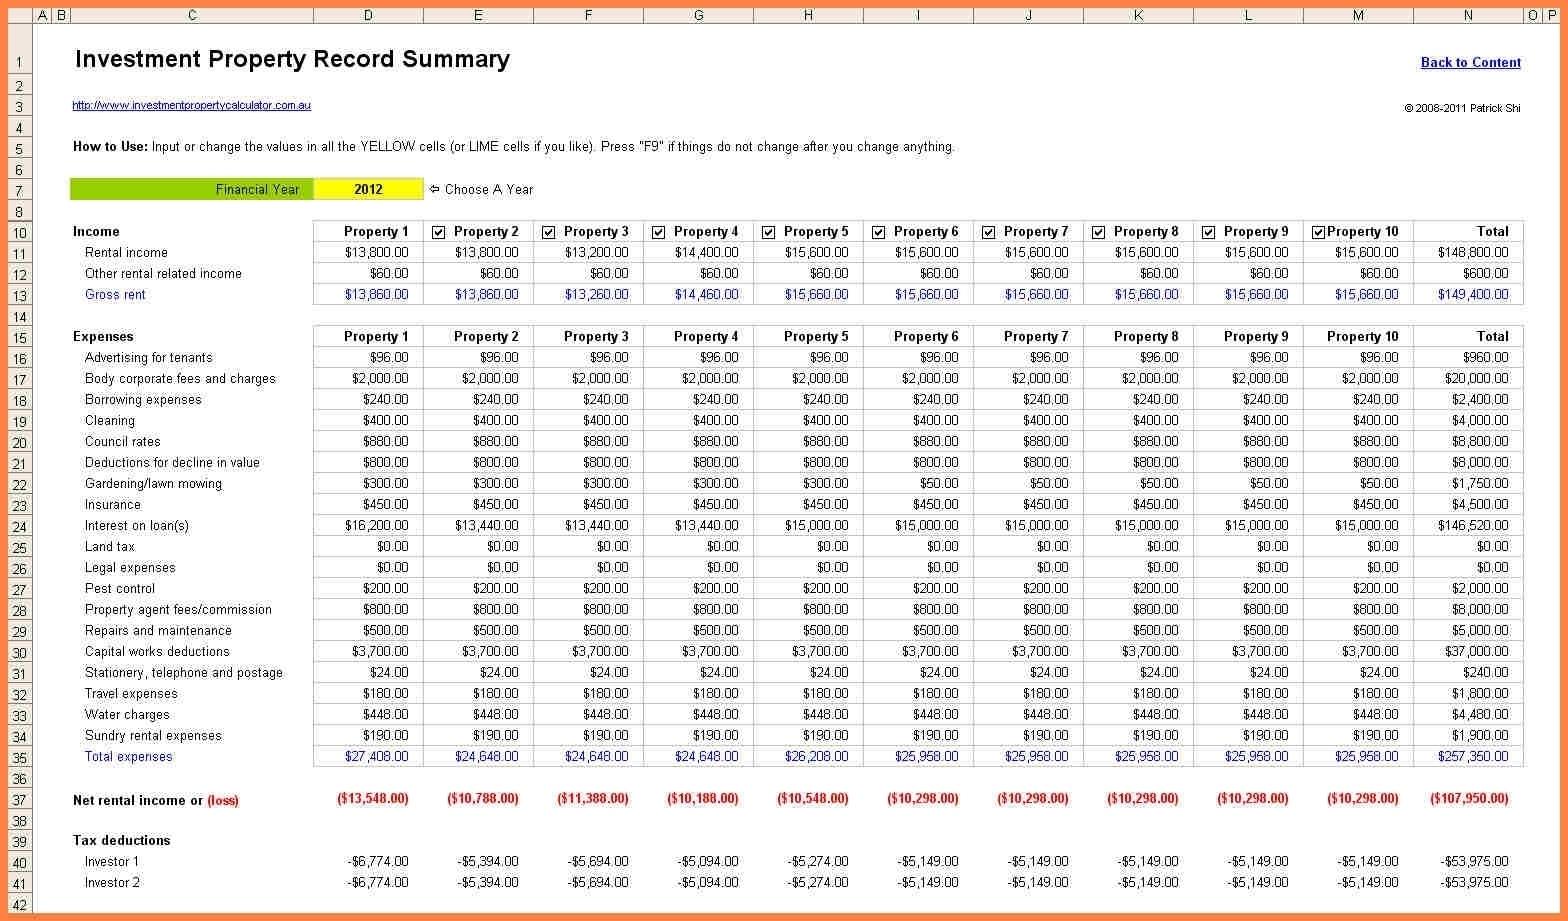 Landlord Accounts Spreadsheet Free Landlord Spreadsheet Free Inside Landlord Accounting Spreadsheet